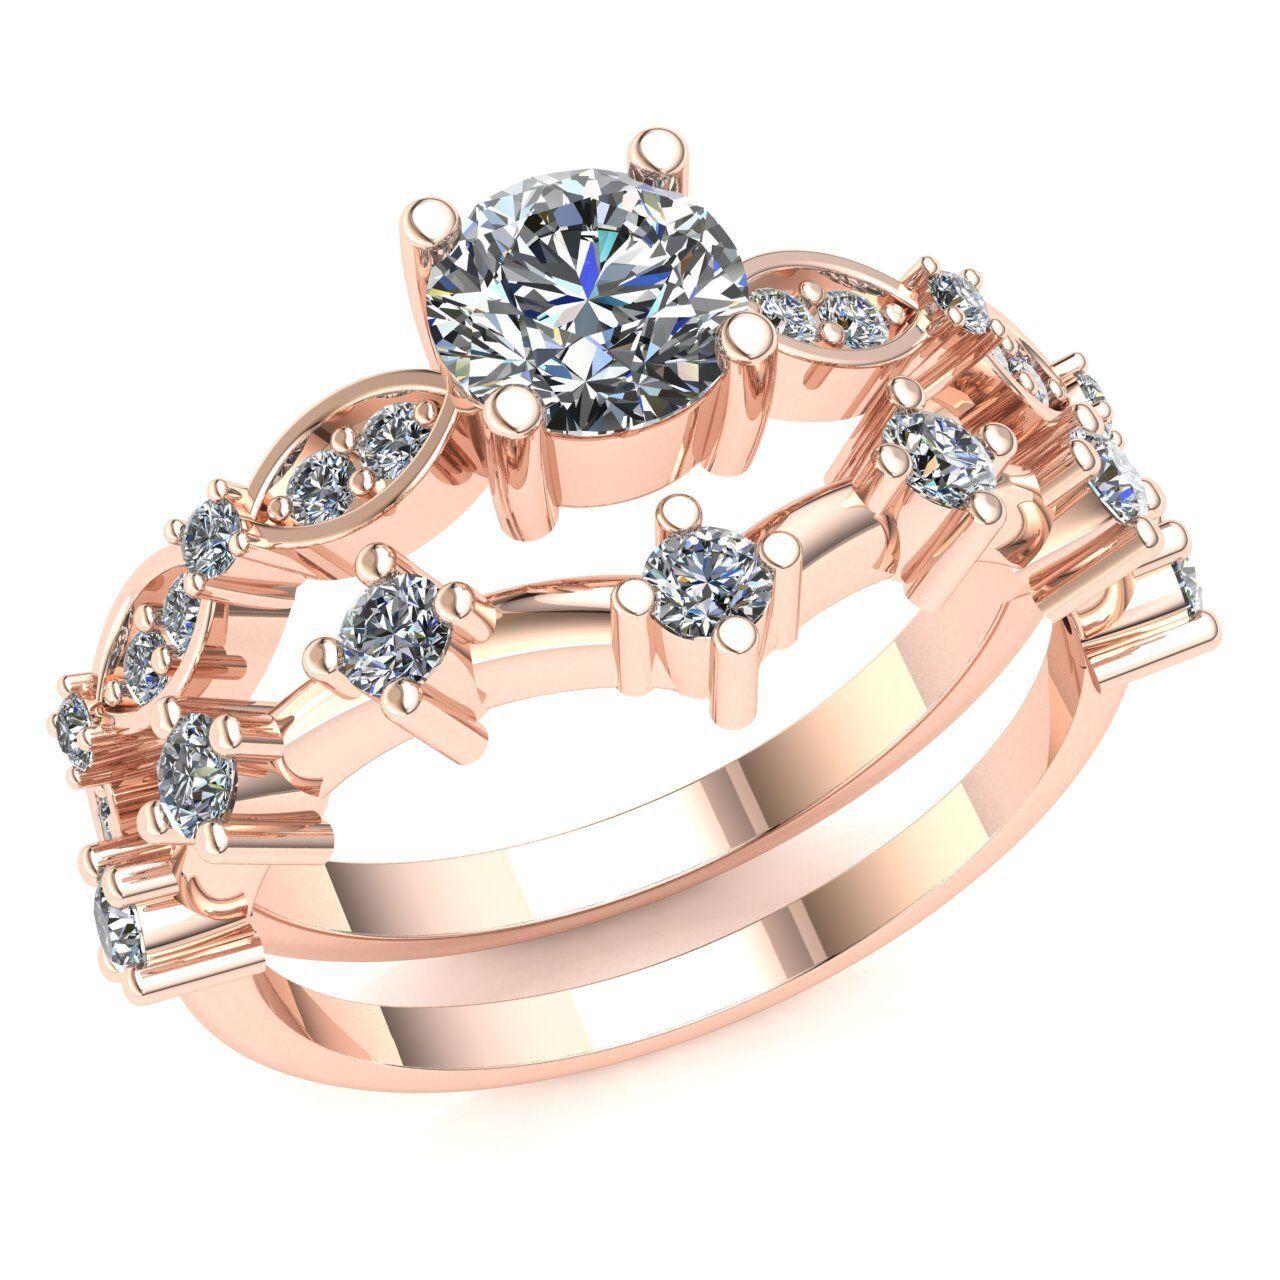 Genuine 1ct Round Cut Diamond Fancy Solitaire Bridal Engagement Set 10K gold